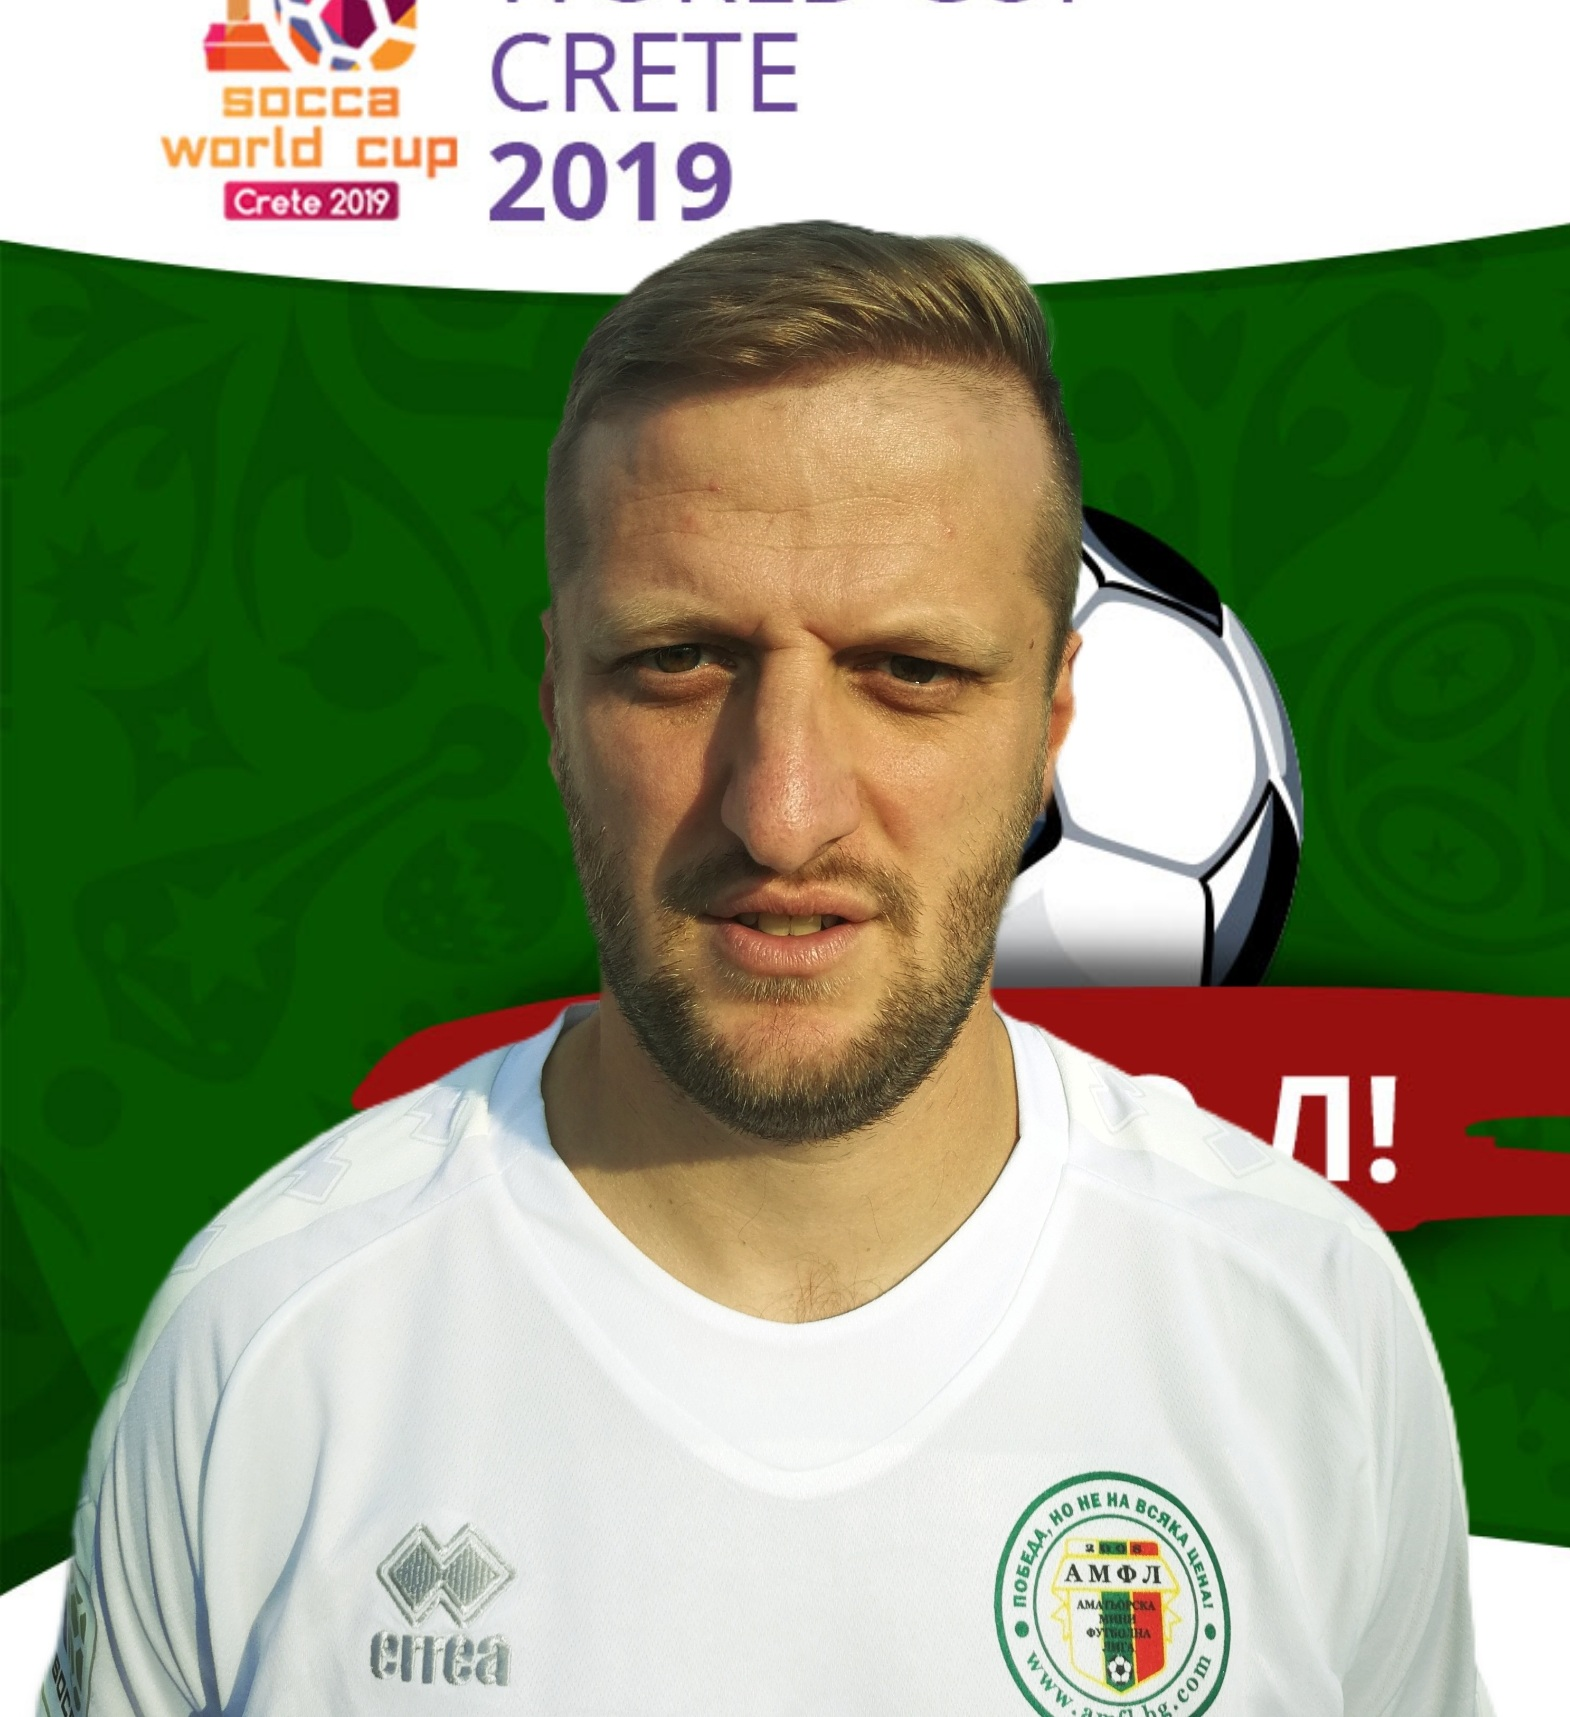 TSVETAN TRAYKOV